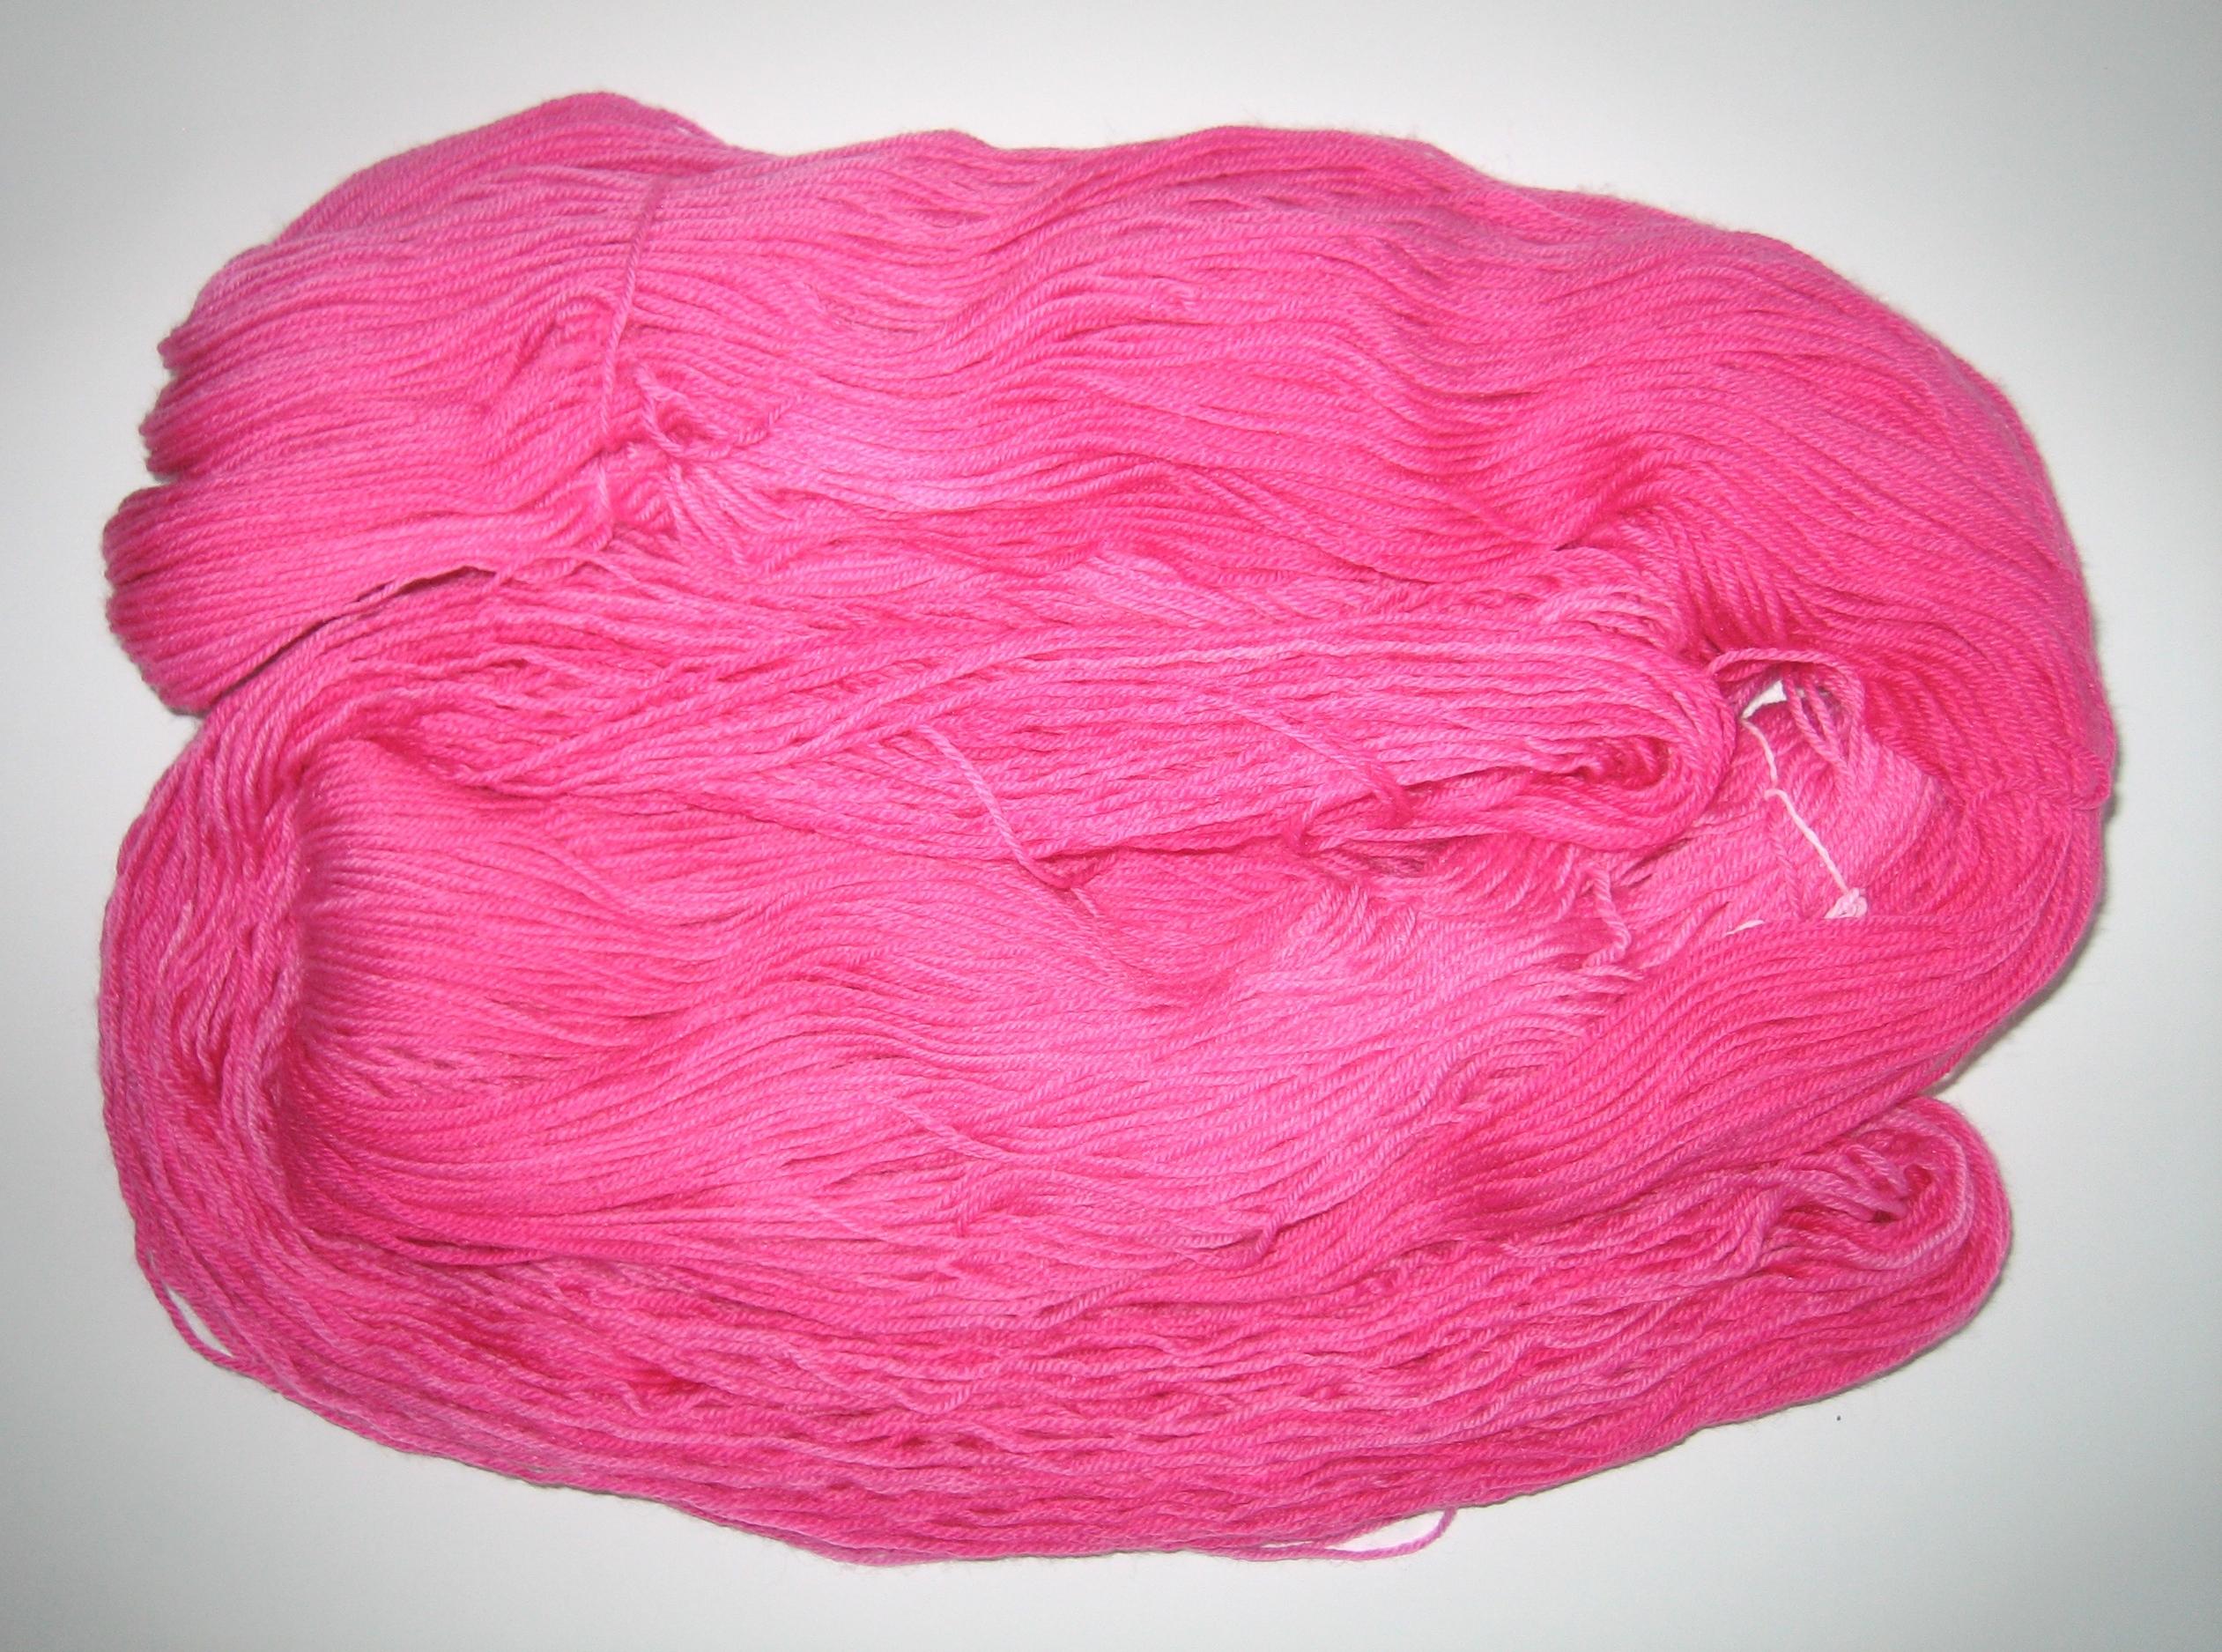 garnyarn-håndfarvet-garn-tynd-merino-nylon-heritage-moerklyseroed